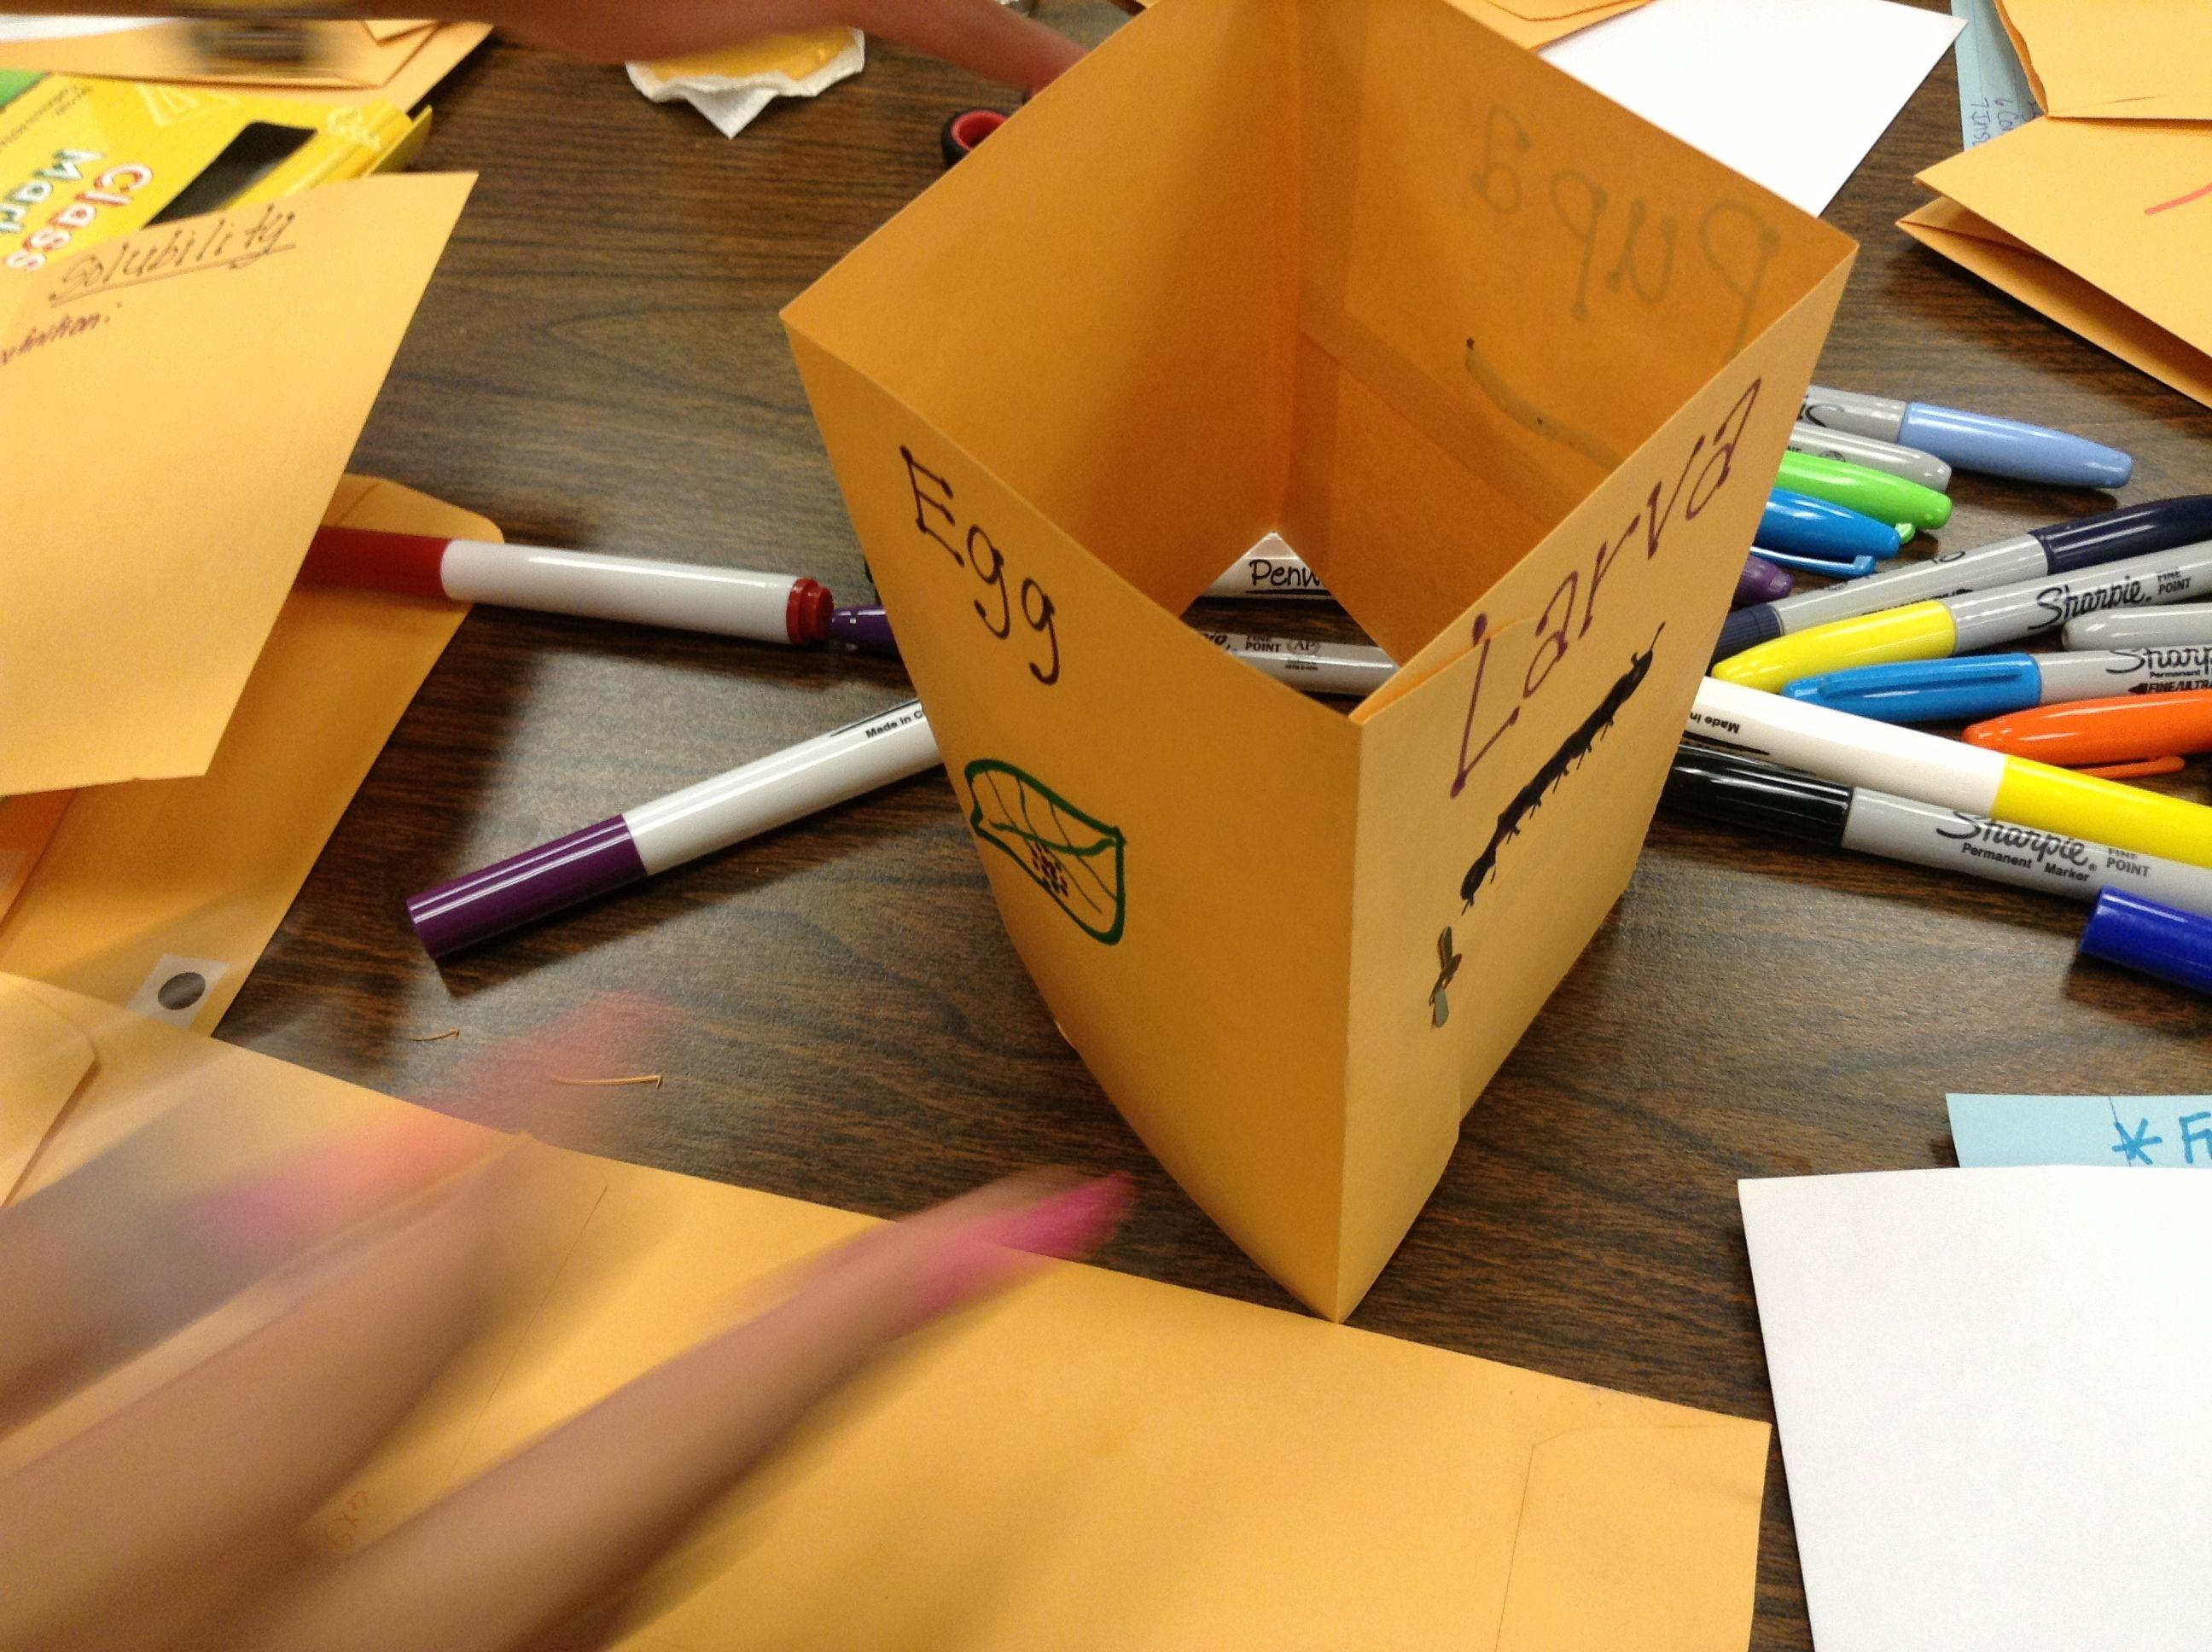 Foldable Square Envelope That Fits Into Merger Envelope